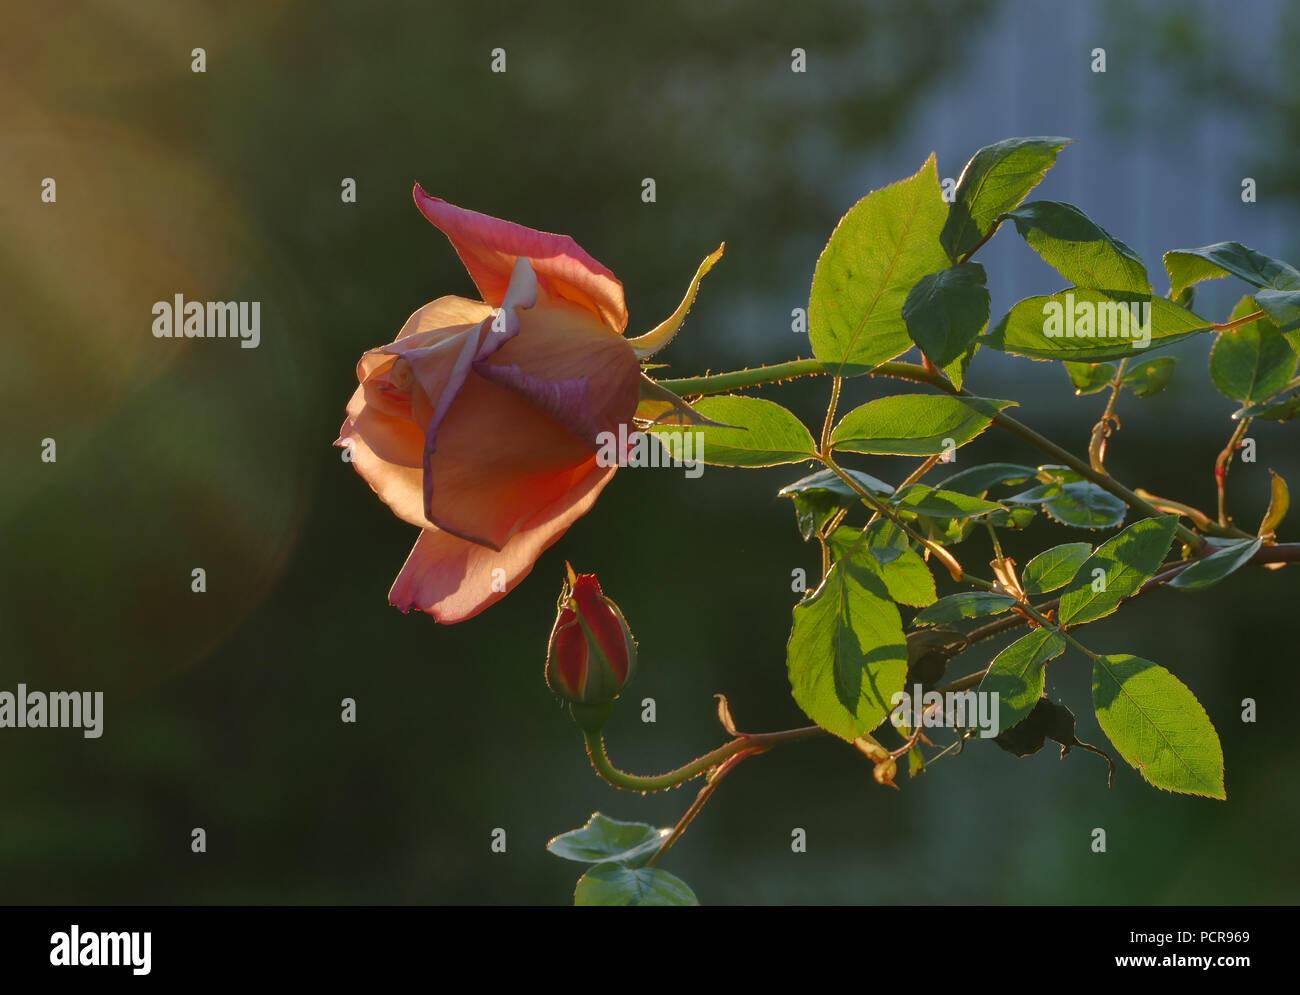 Orange rose in the sunshine - Stock Image